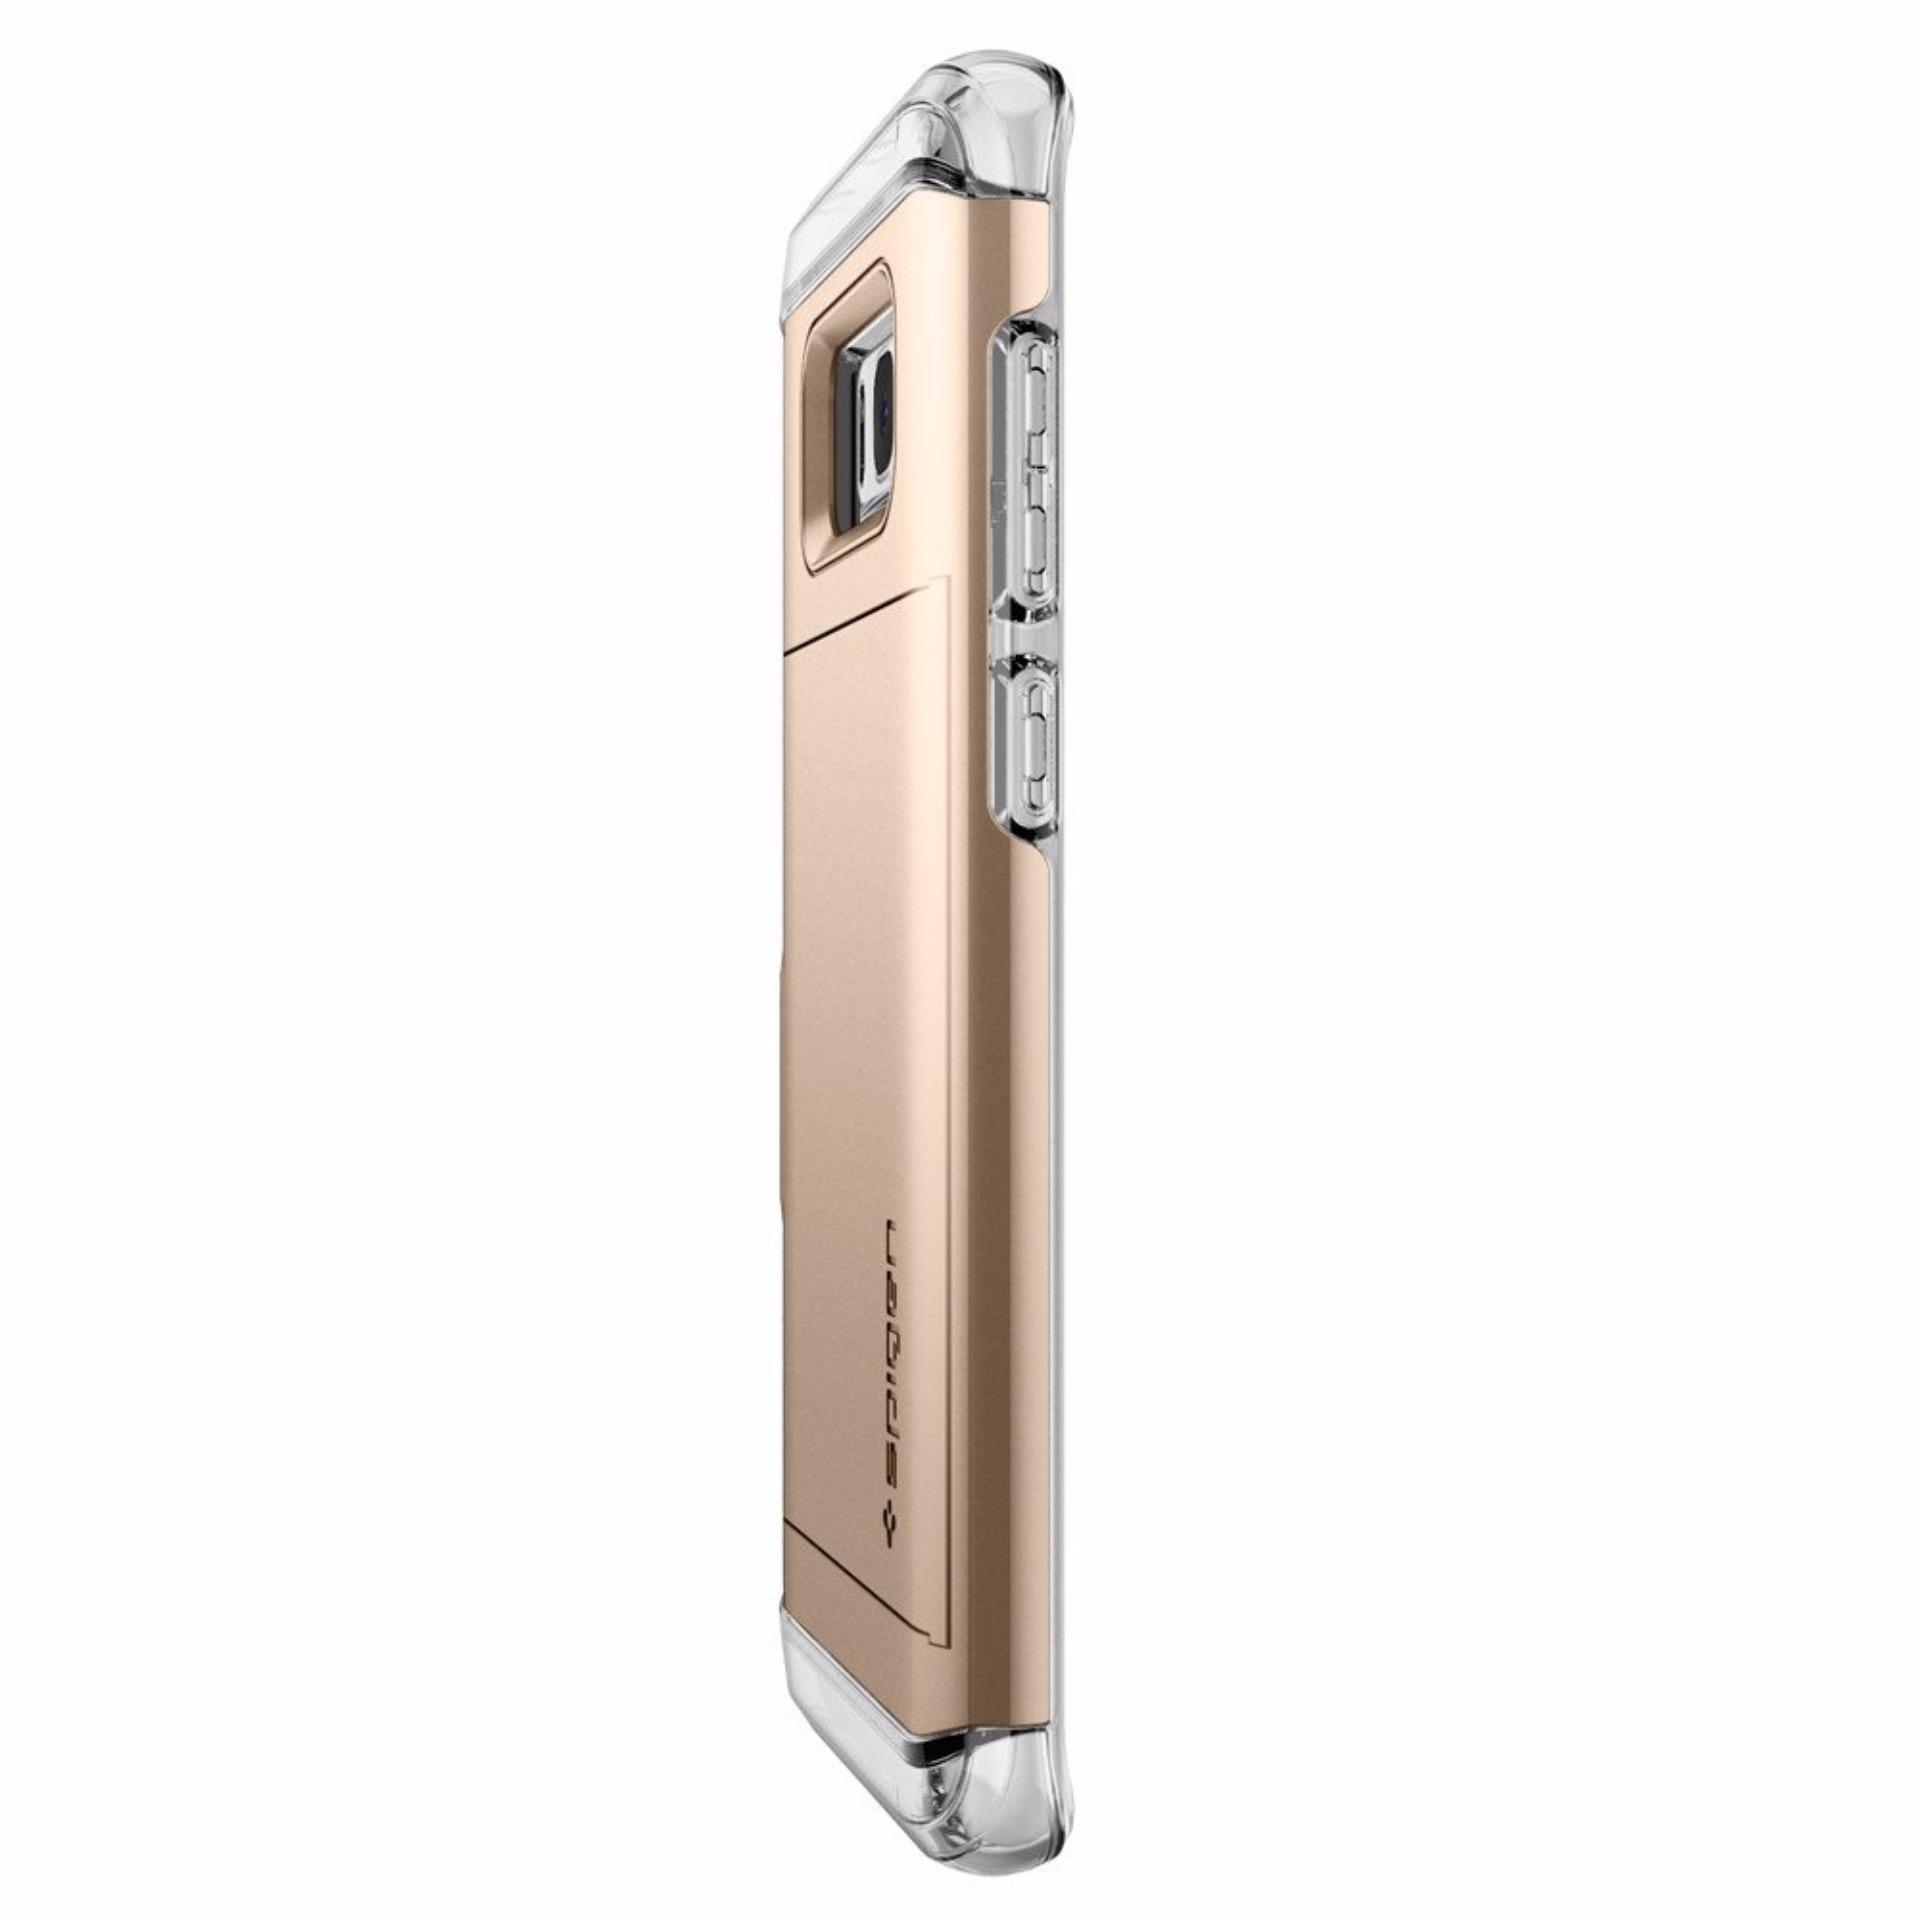 Spigen Premium Case For Samsung Galaxy S8 Plus Crystal Wallet 3 Liquid Original Clear Gold Maple